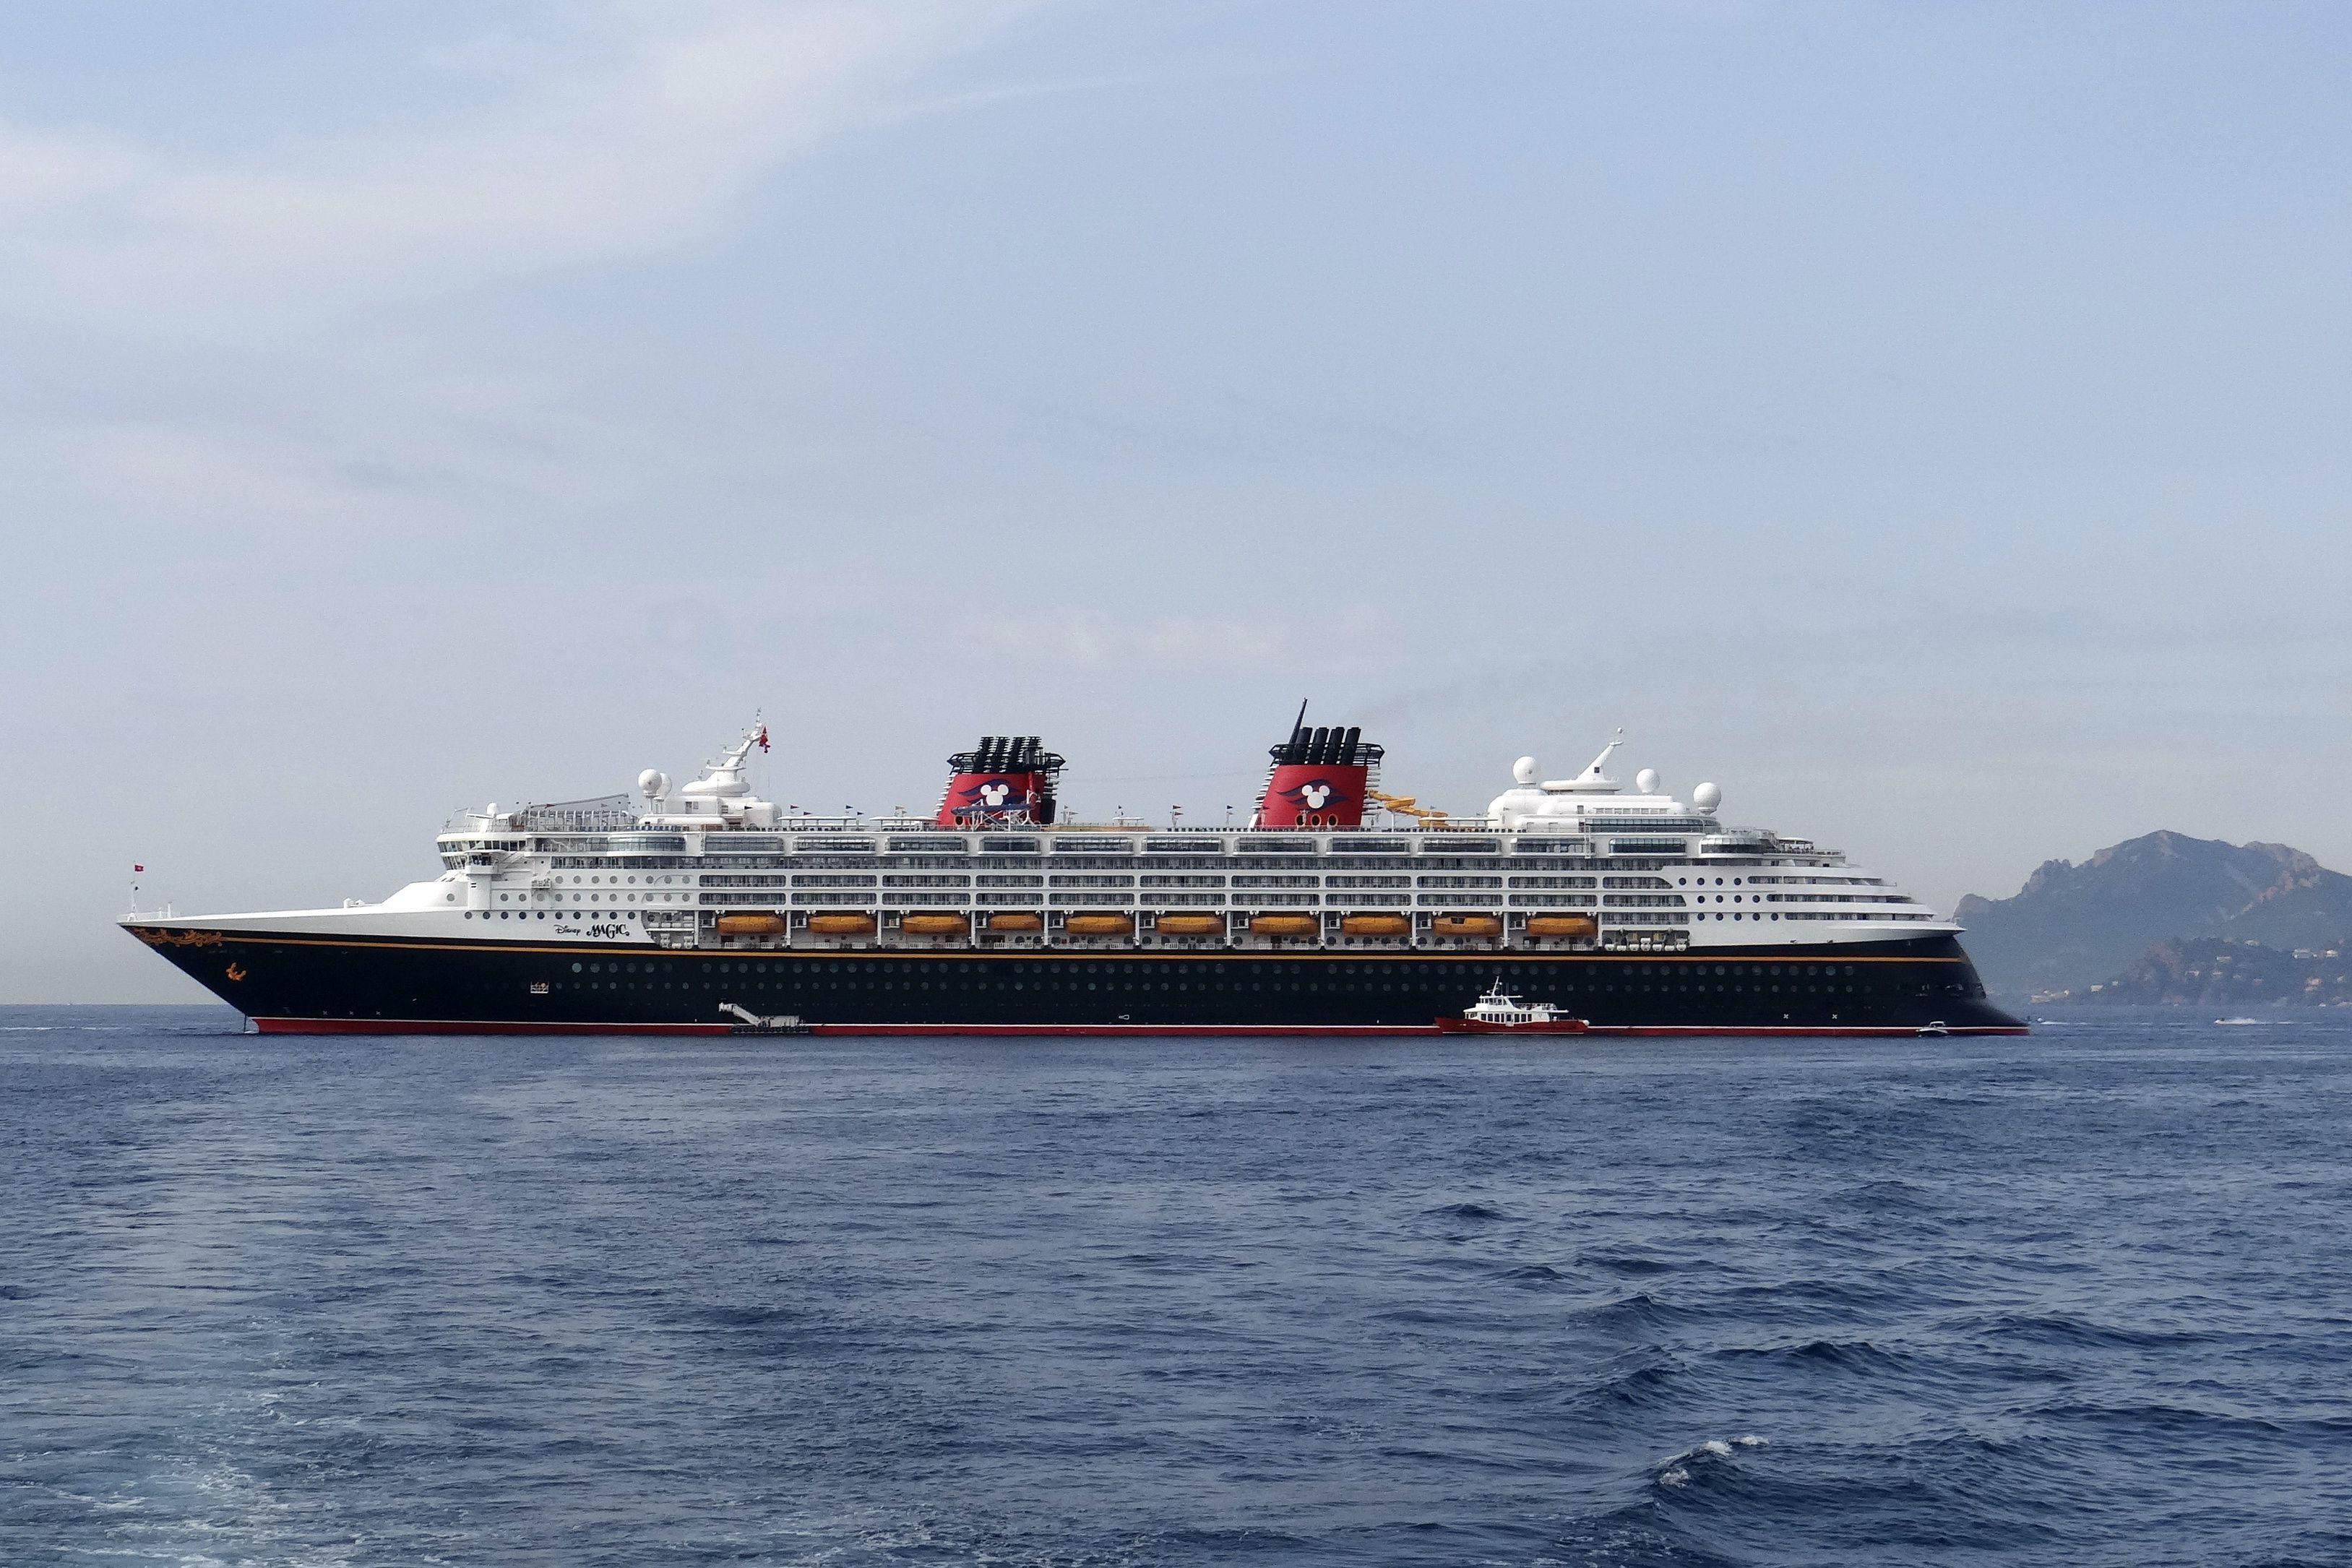 Disney Dream Cruise Ship Virtual Tour - Cruise ships for teens